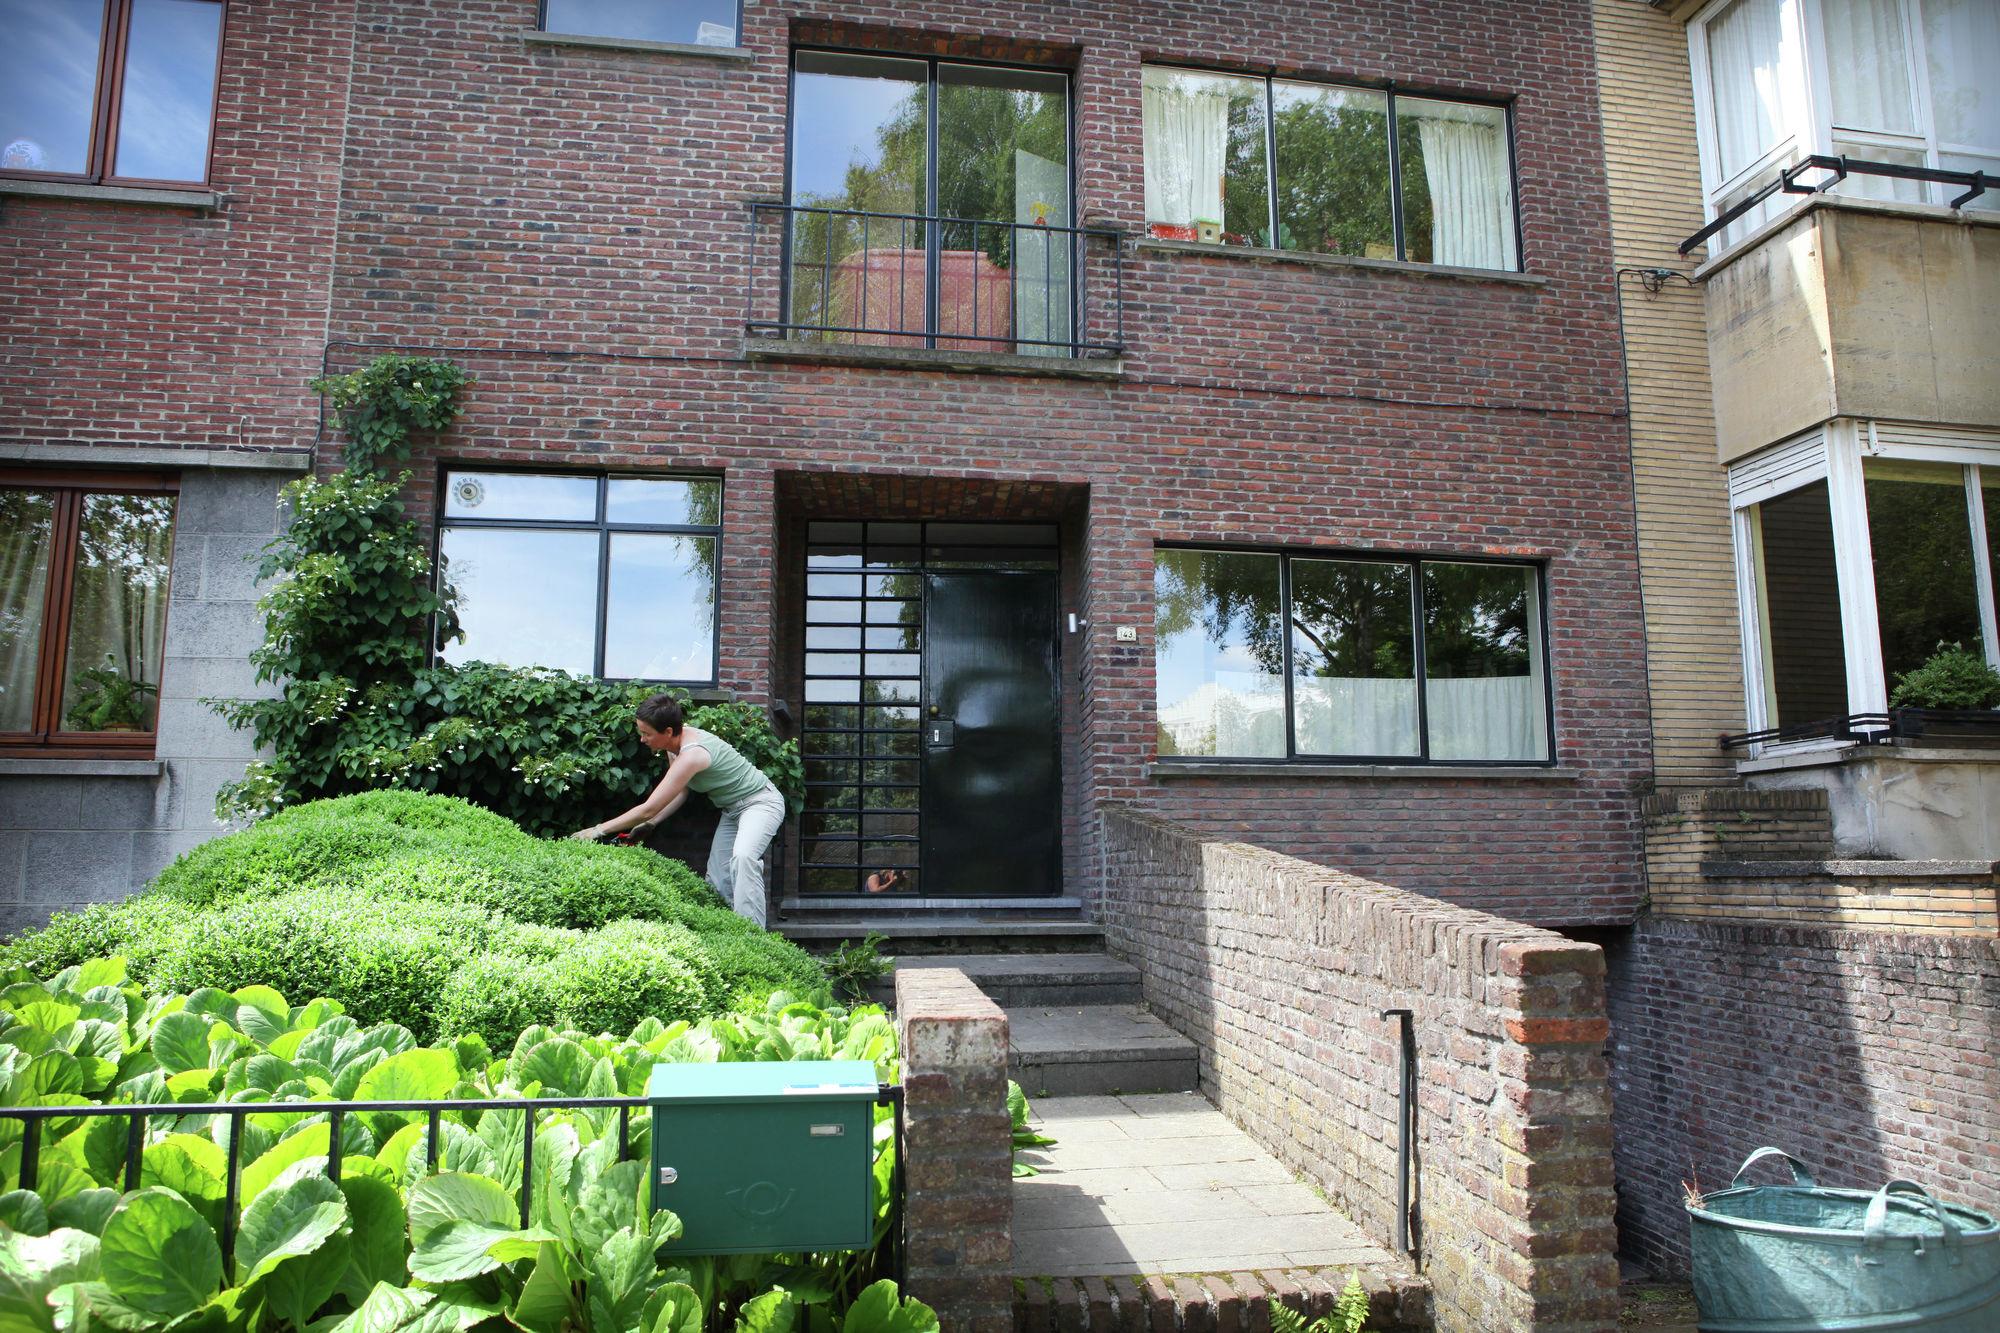 patijntjesstraat voortuintjes (4)©Layla Aerts.jpg